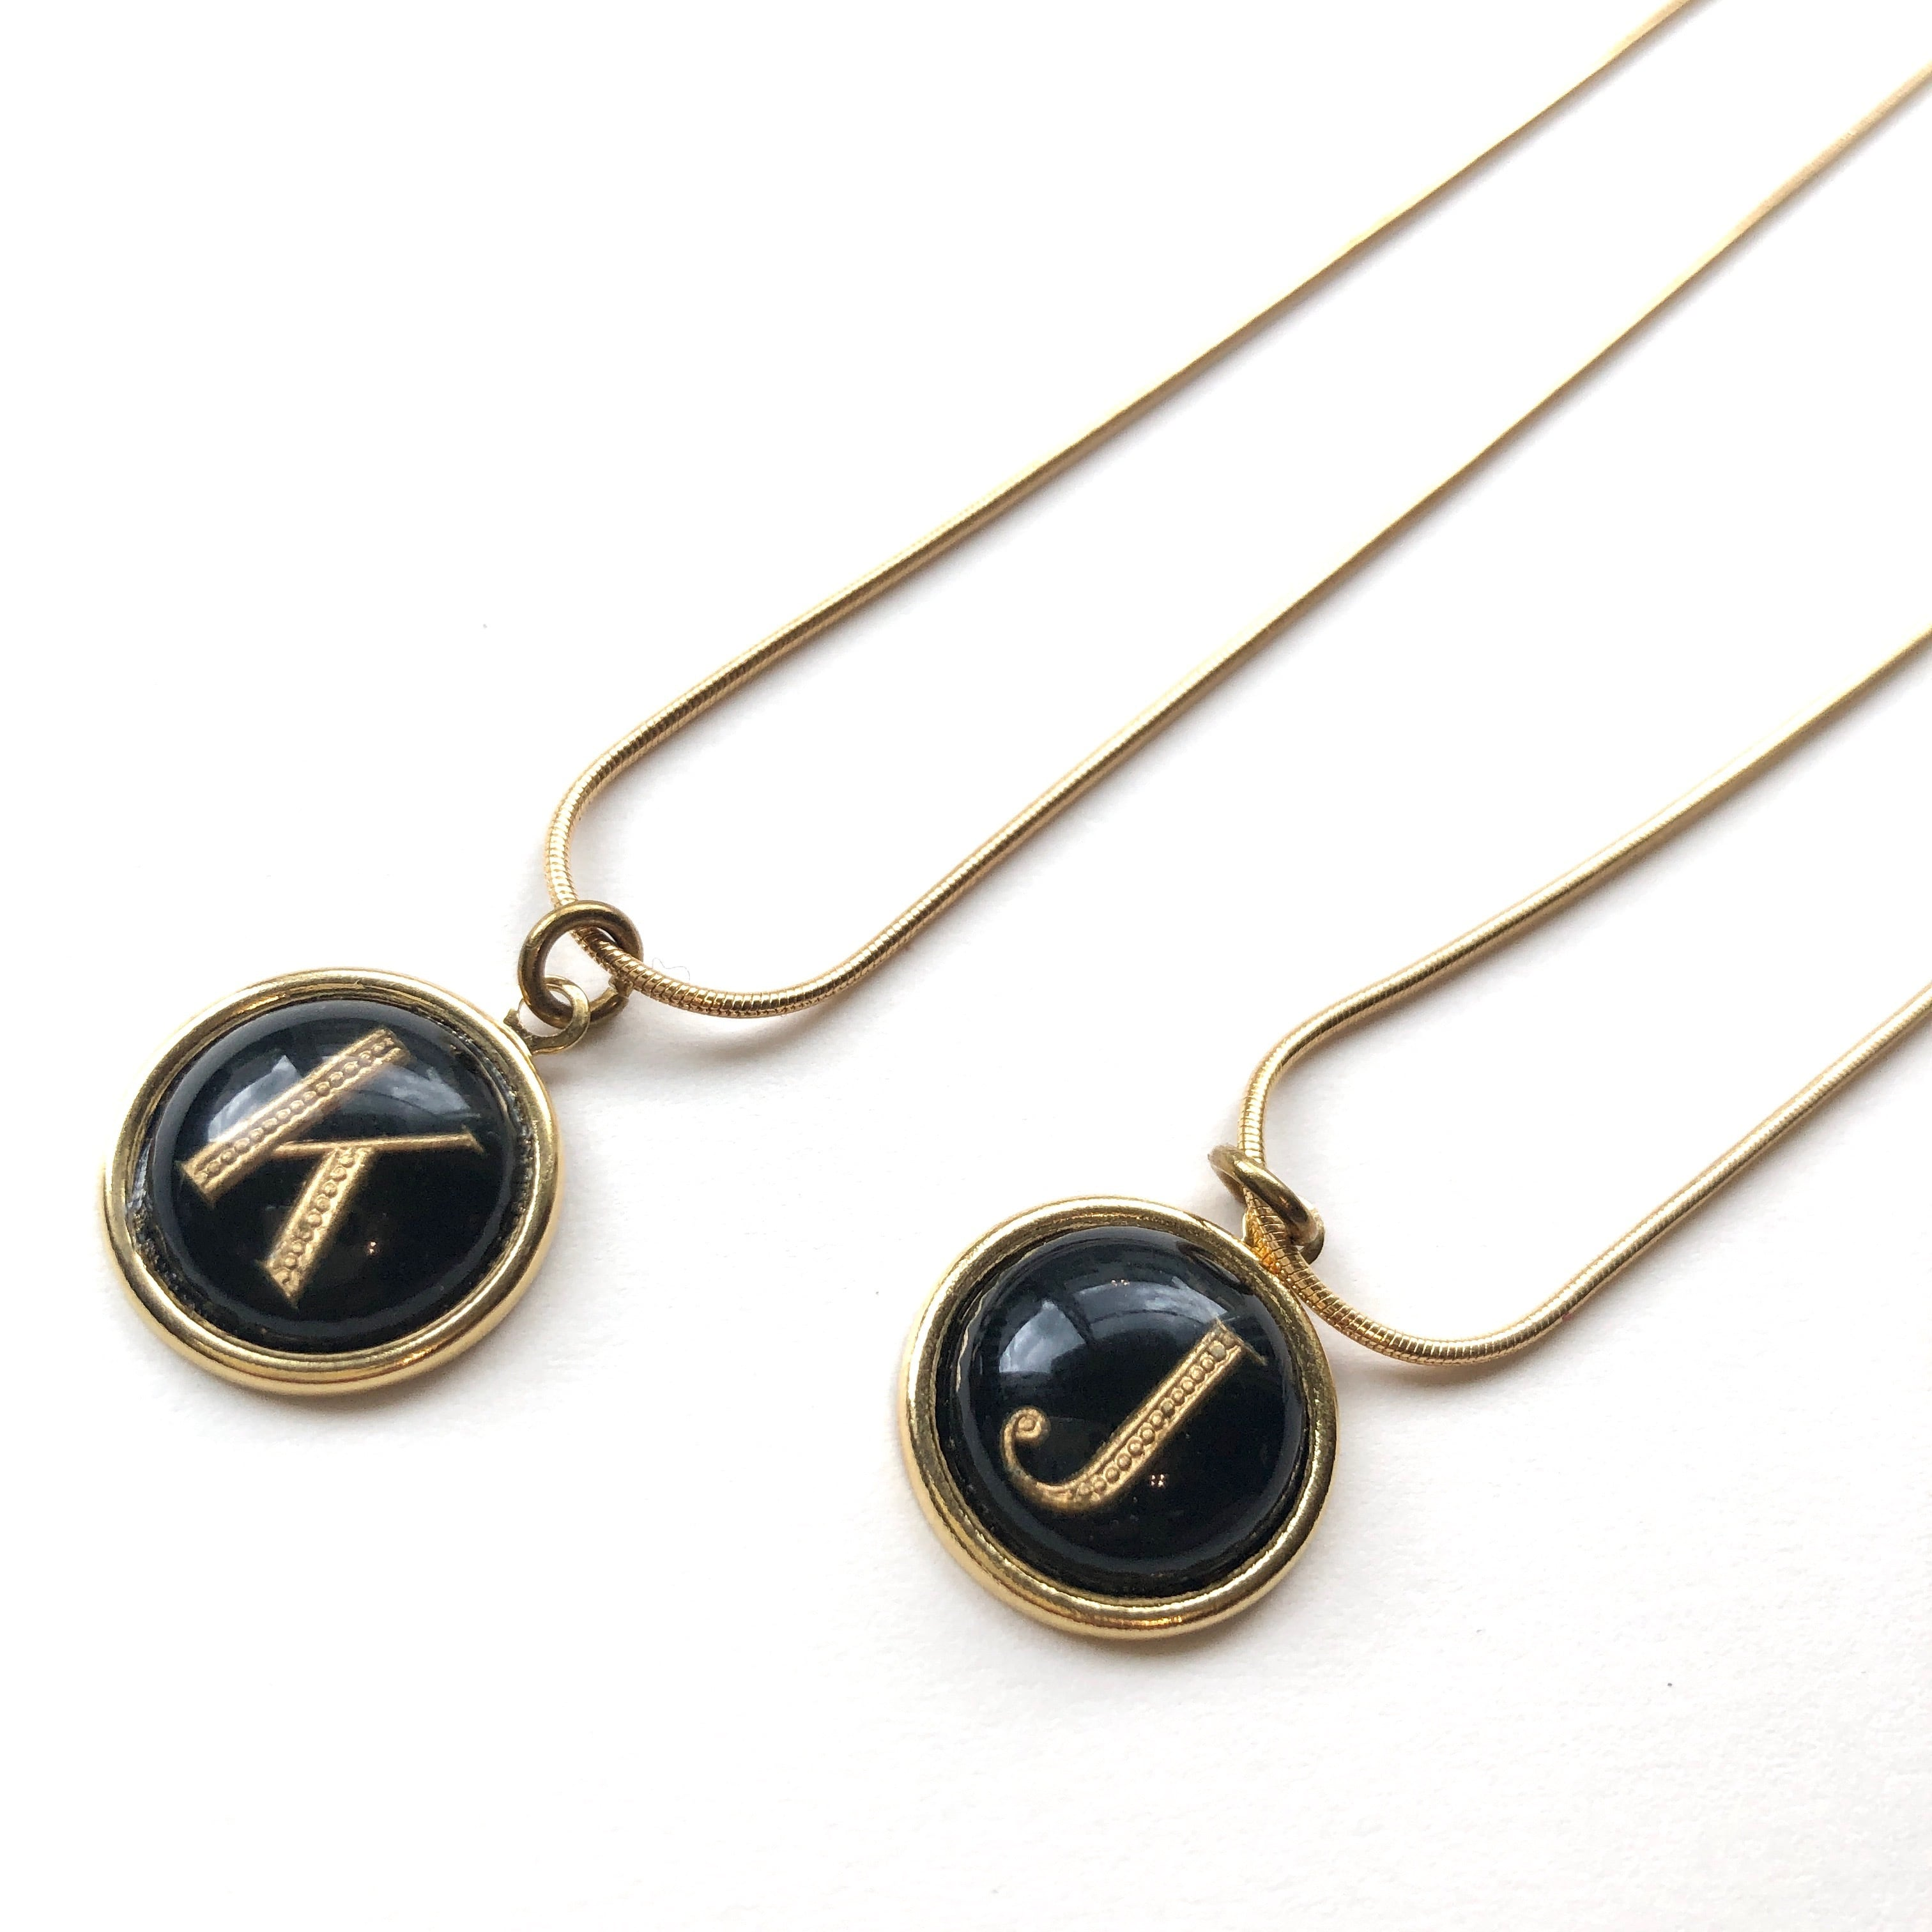 Letter charm necklace NC-031